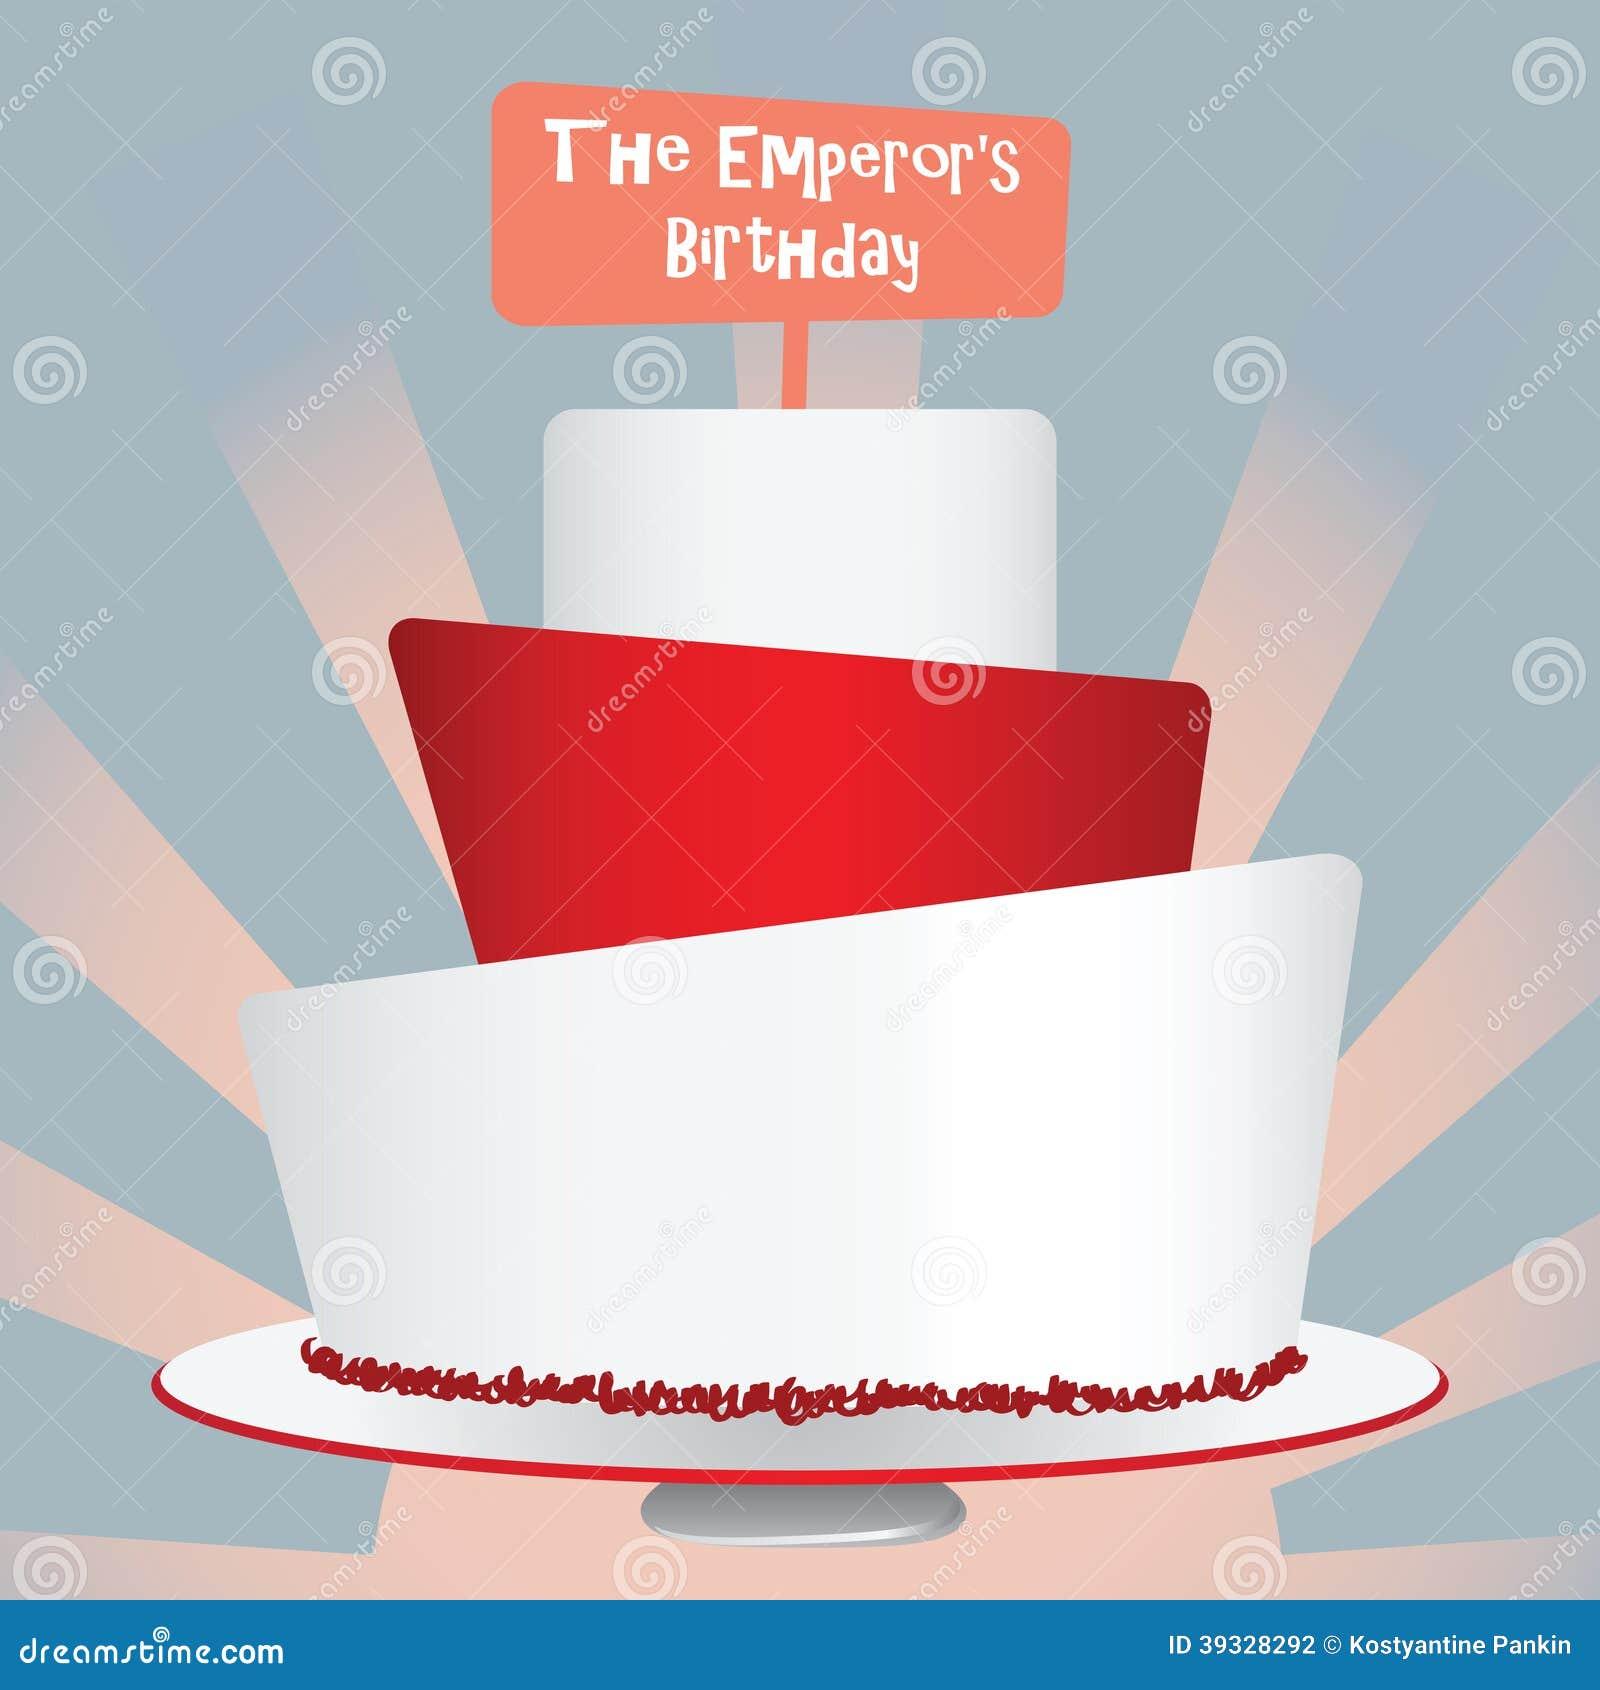 Emperors Birthday Stock Vector